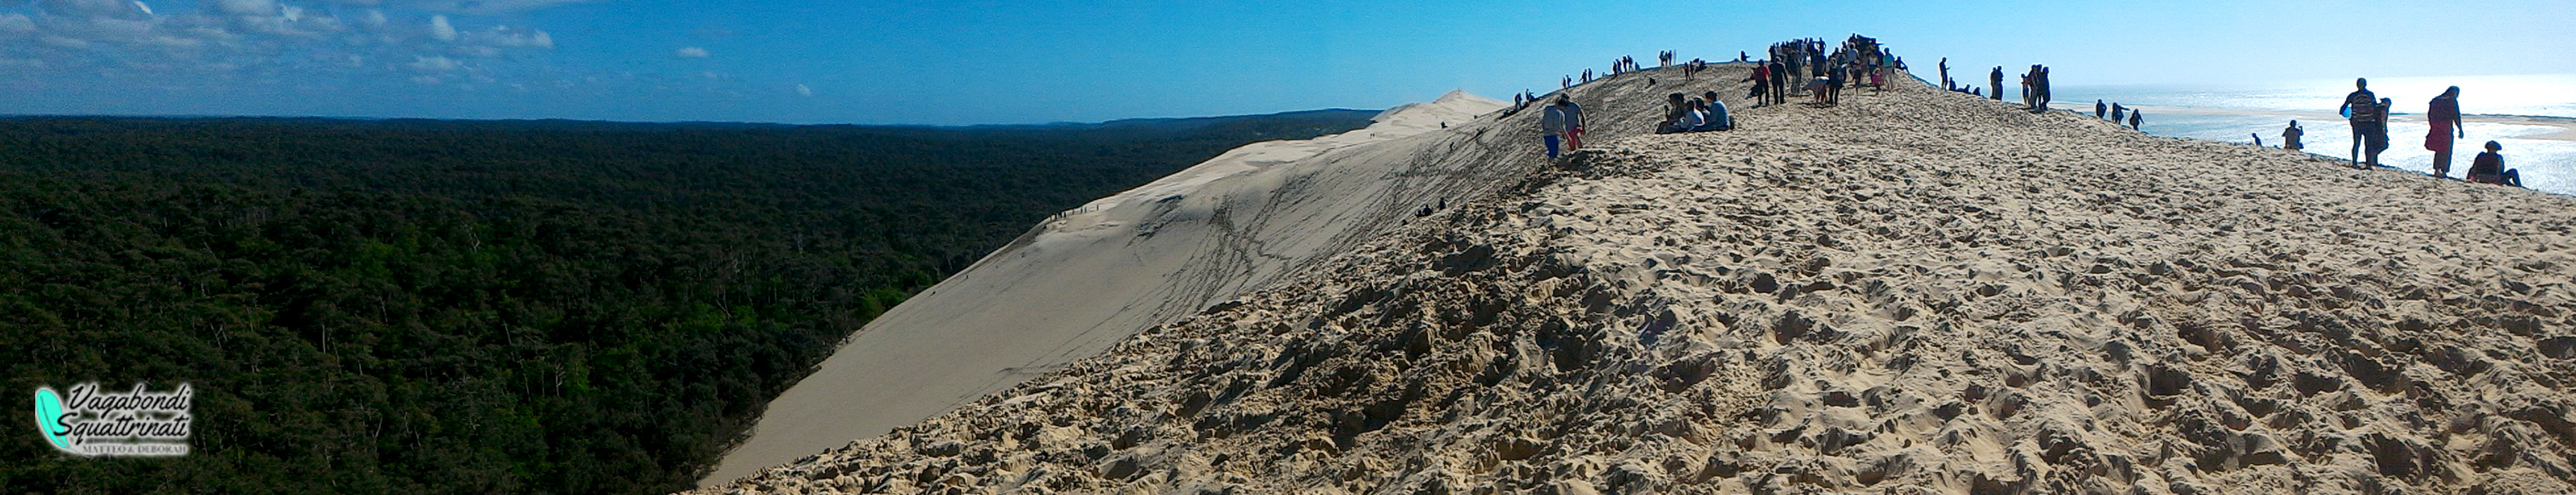 Dune du Pilat Vagabondi Squattrinati